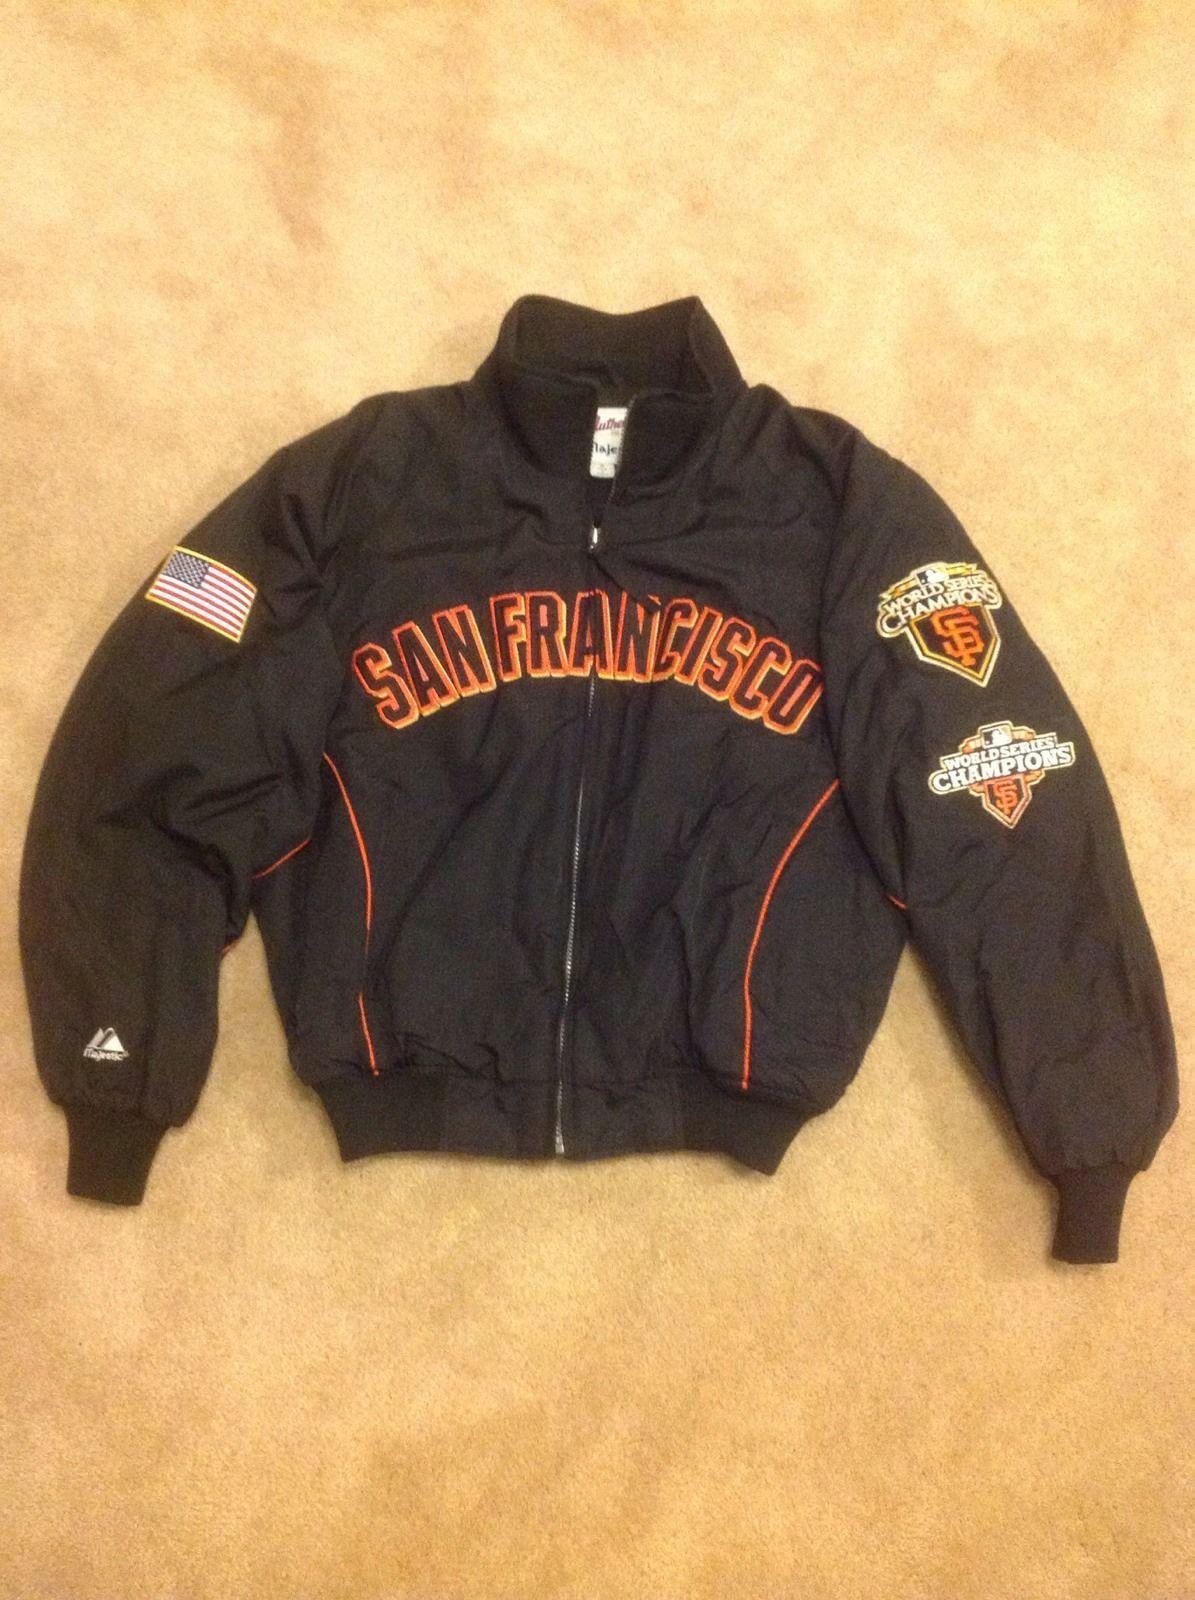 factory price ba96c f4b28 San Francisco SF Giants Majestic Jacket Small Rare Hard to ...